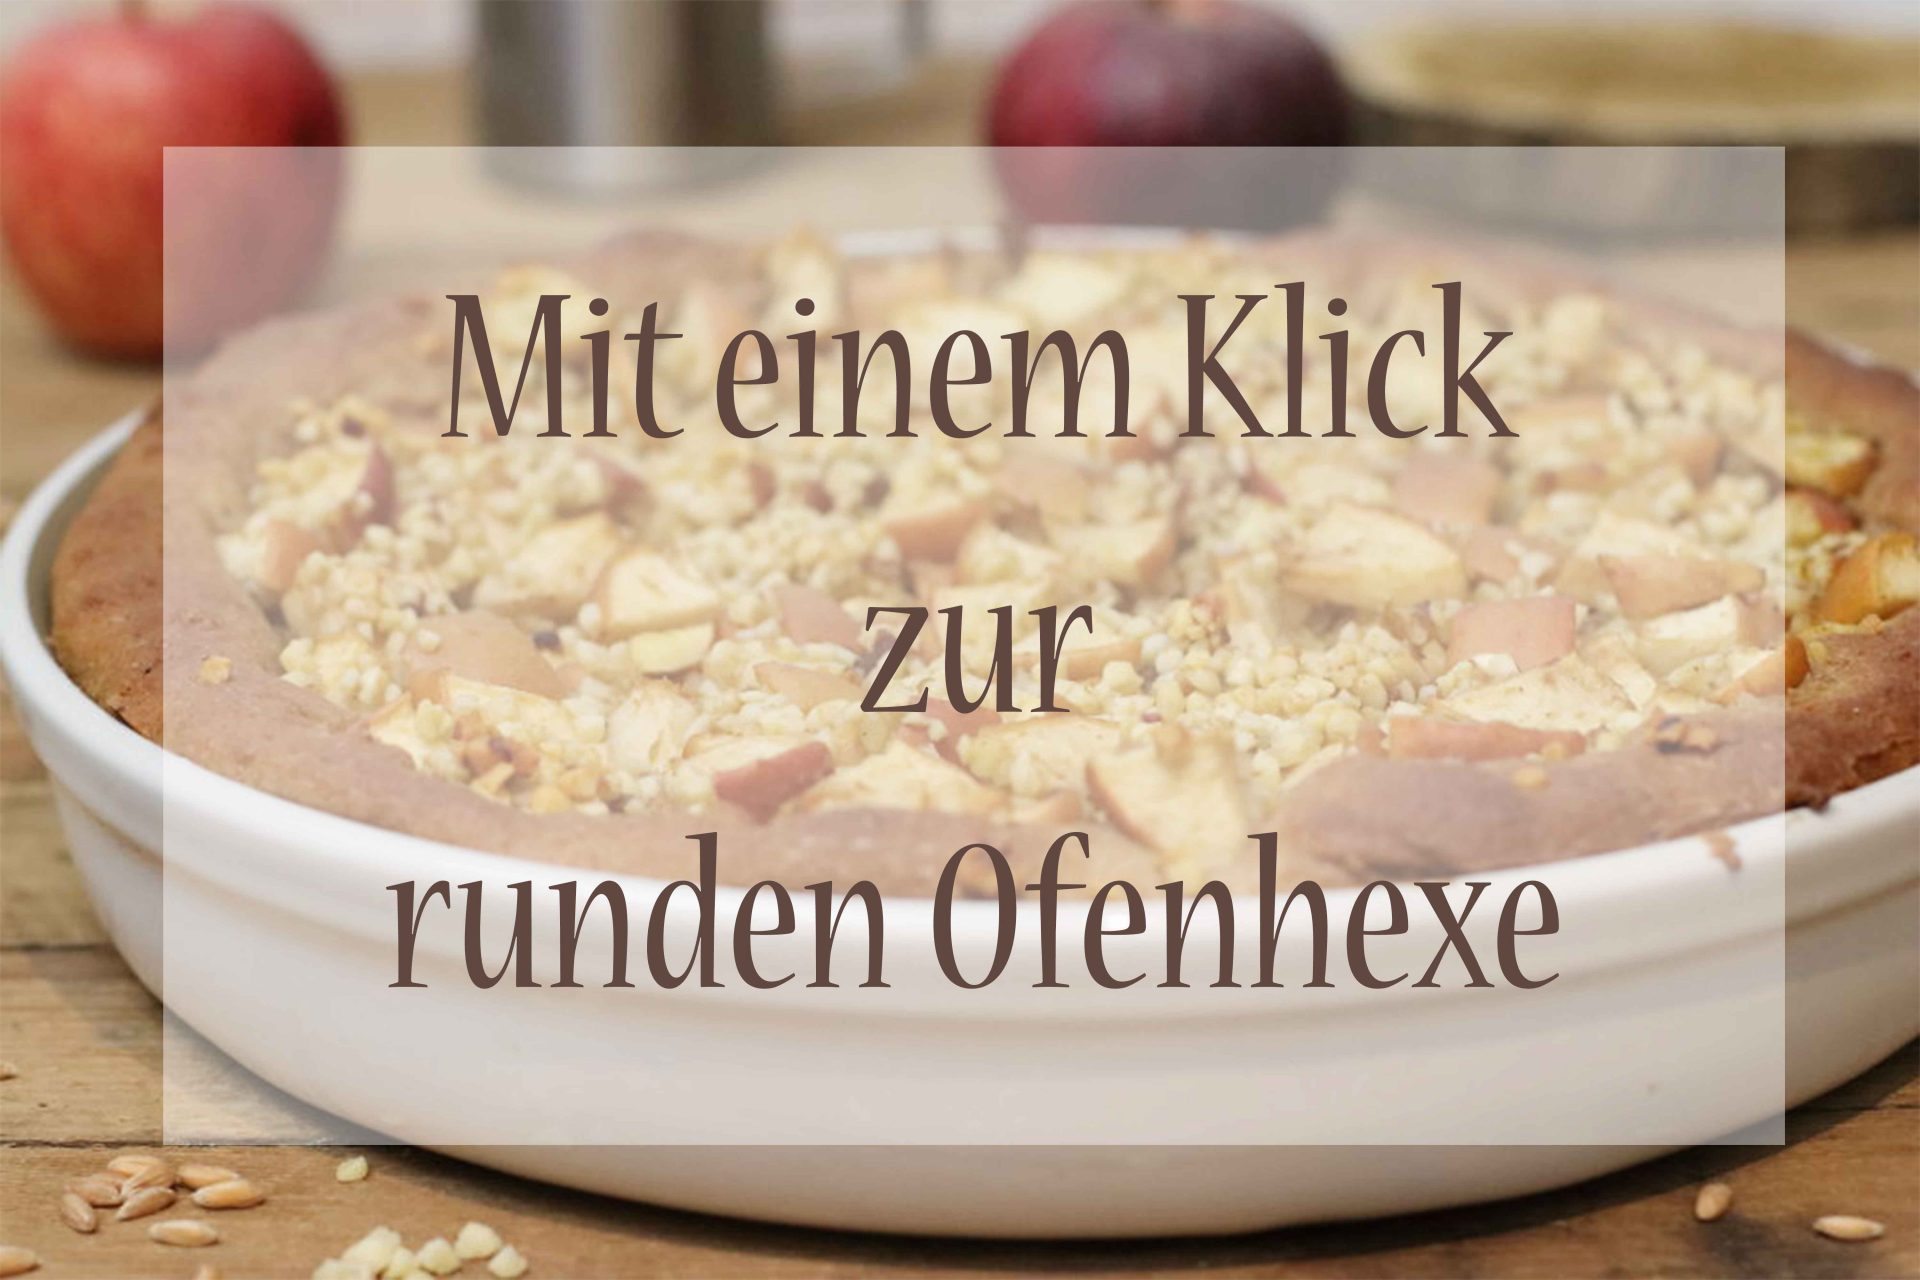 runde Ofenhexe bestellen Foodrevers Pampered Chef